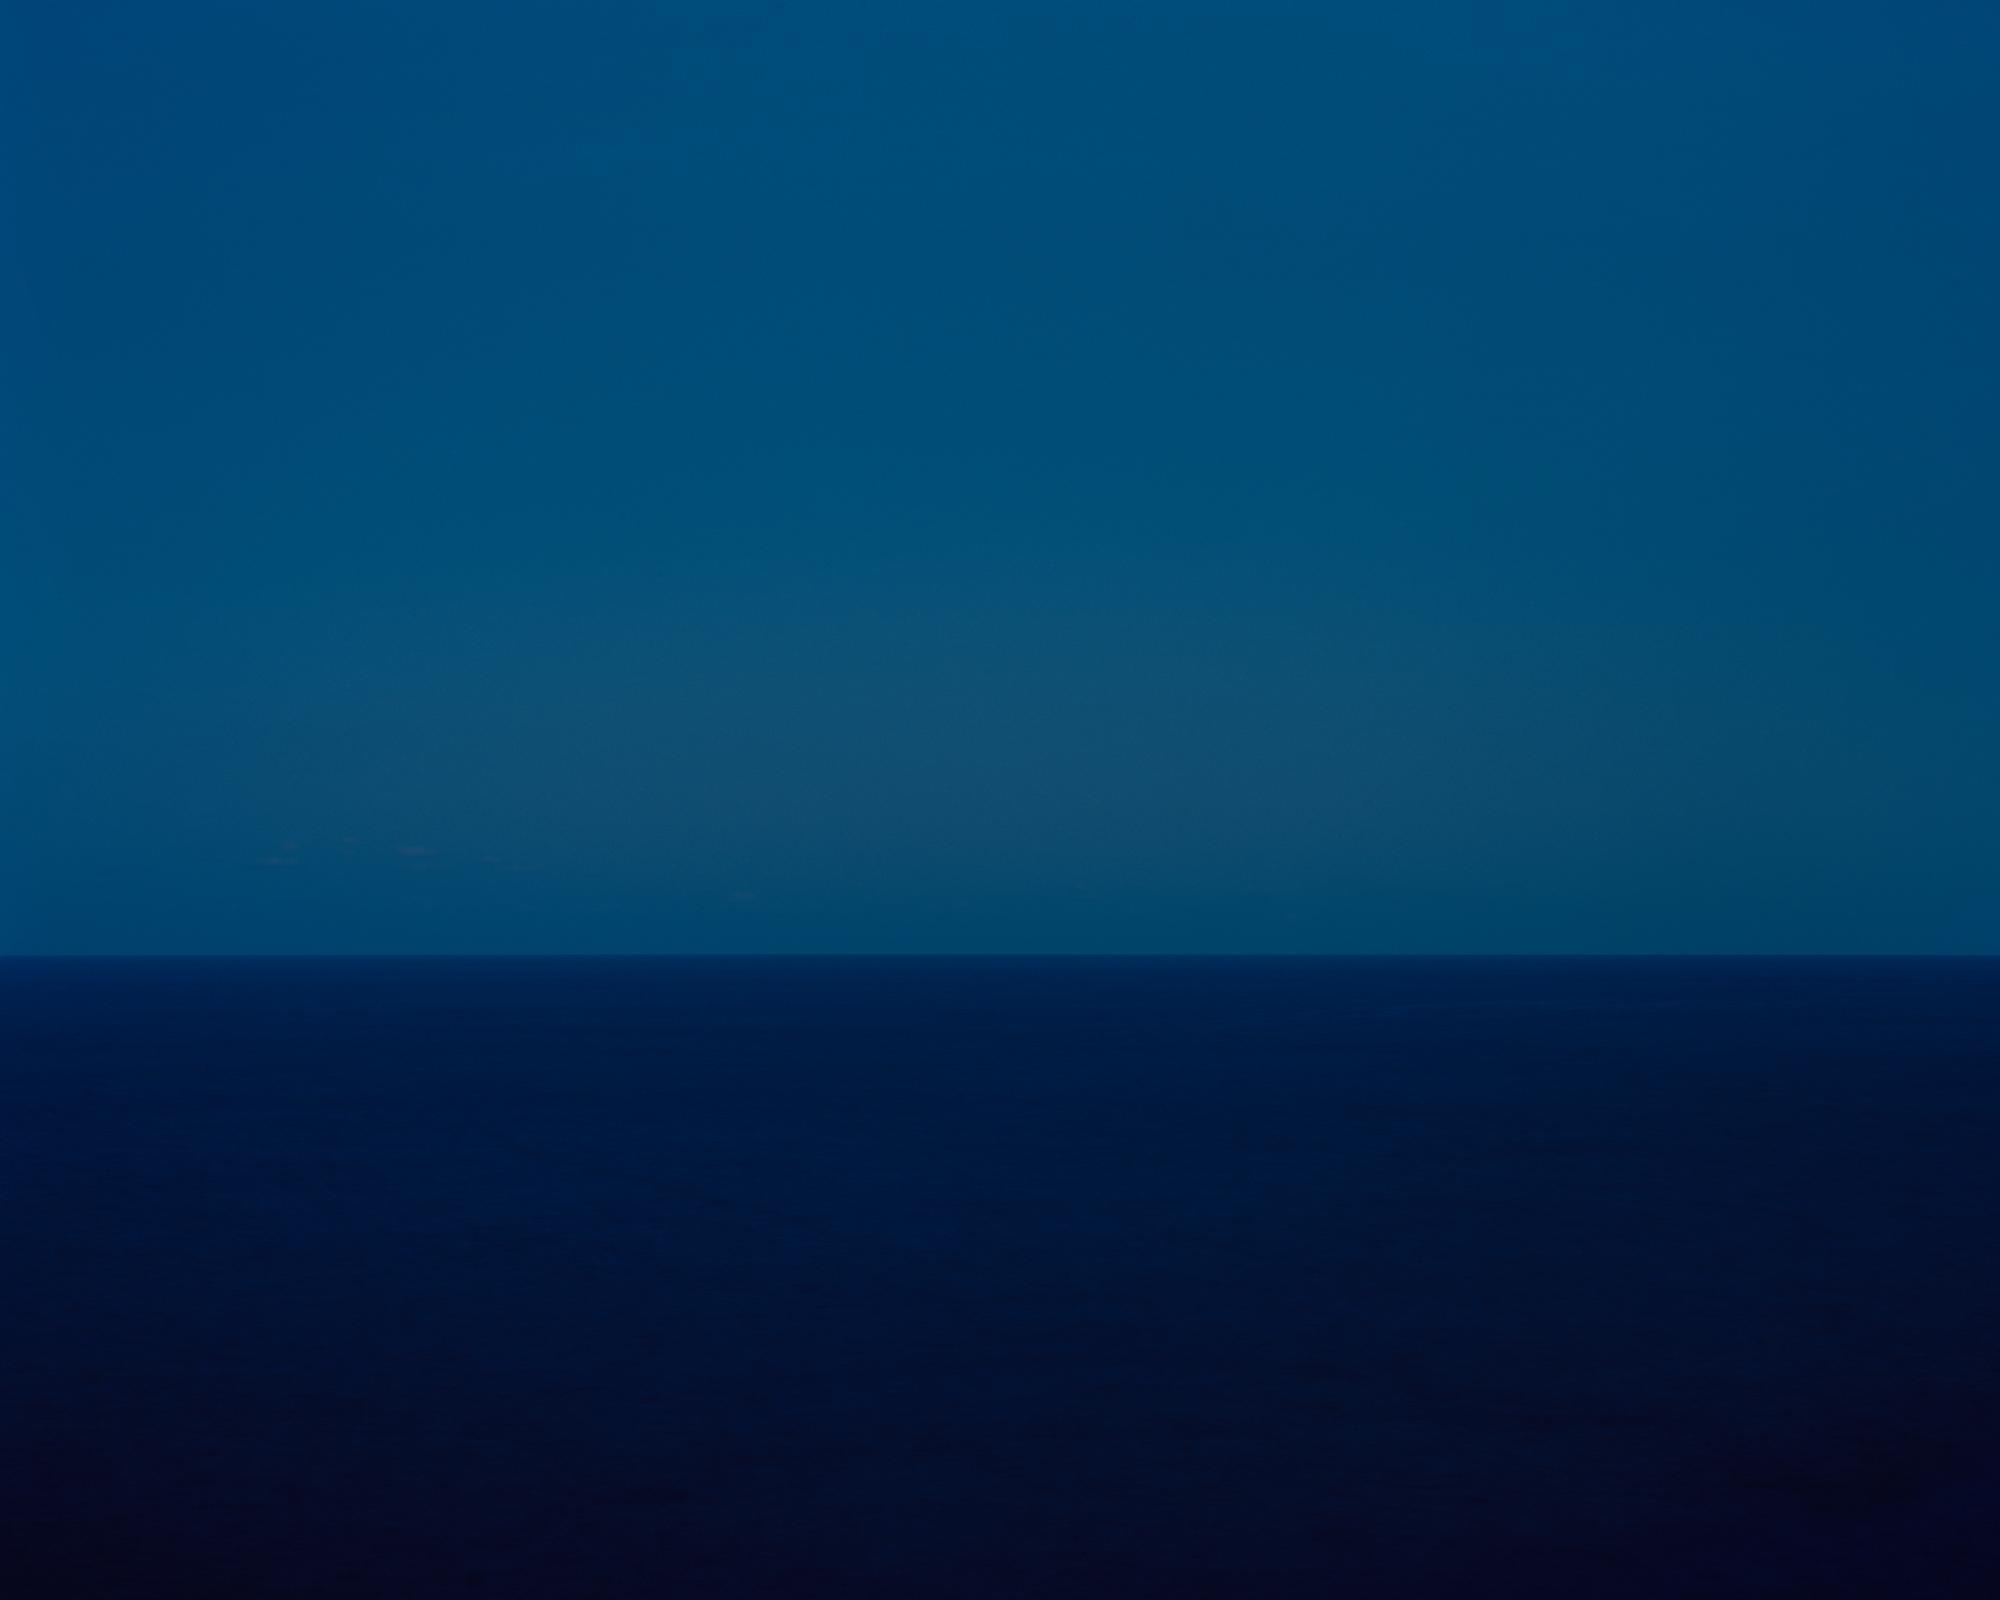 Harry Culy: Seascape #122, blue/blue, The Gap, Vaucluse, Sydney, Australia 2018